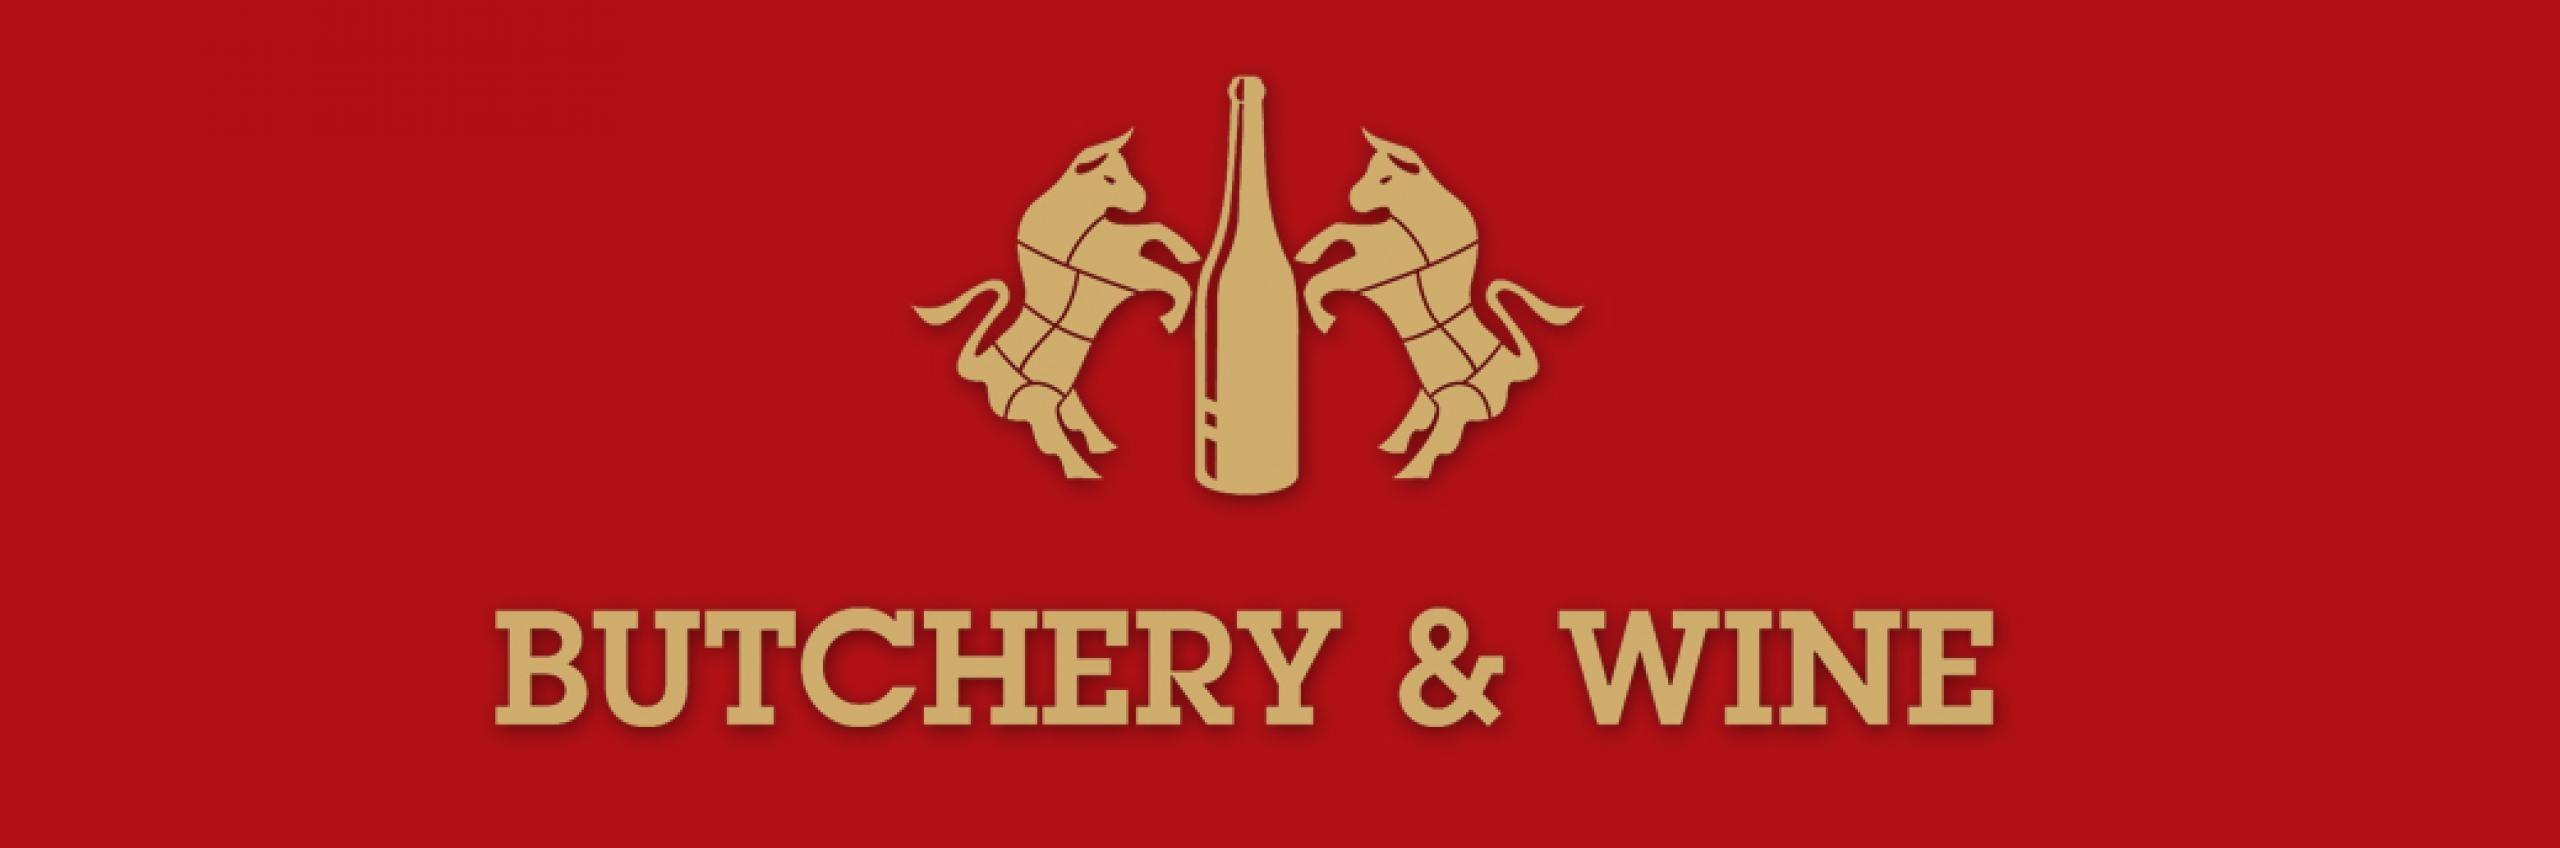 Butchery&Wine, premium steakhouse